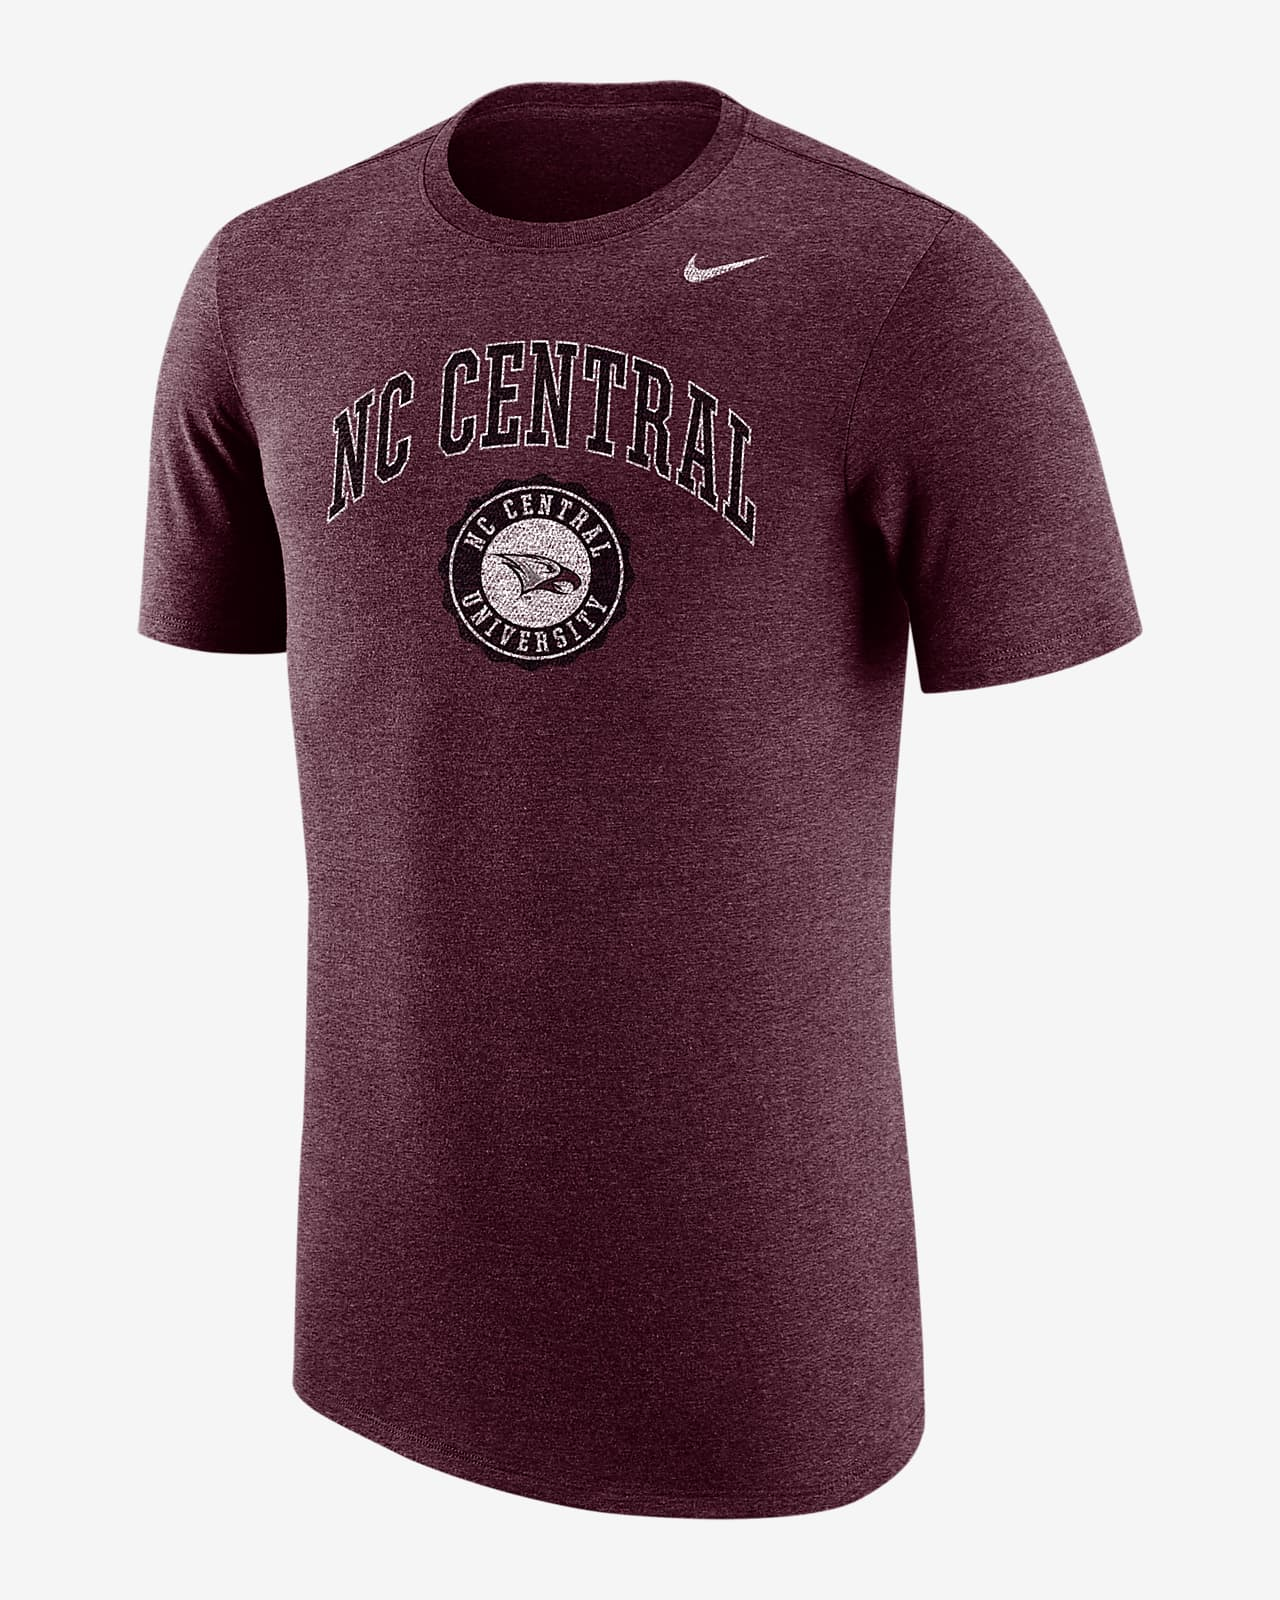 Nike College (North Carolina Central) Men's T-Shirt